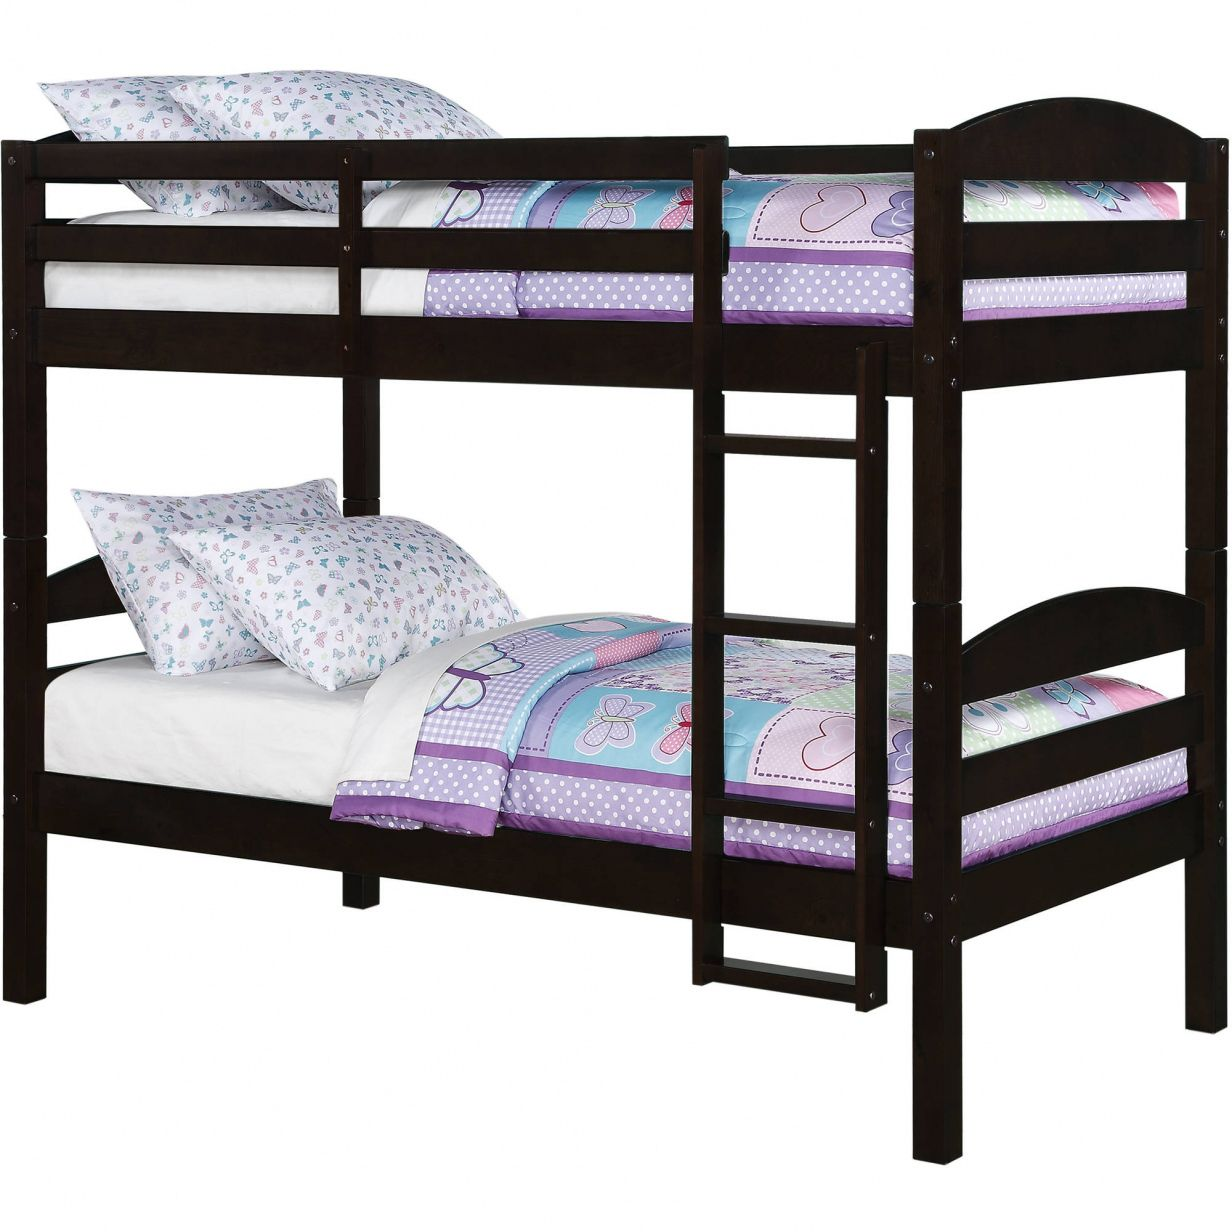 Mattress Elegant Bunk Bed